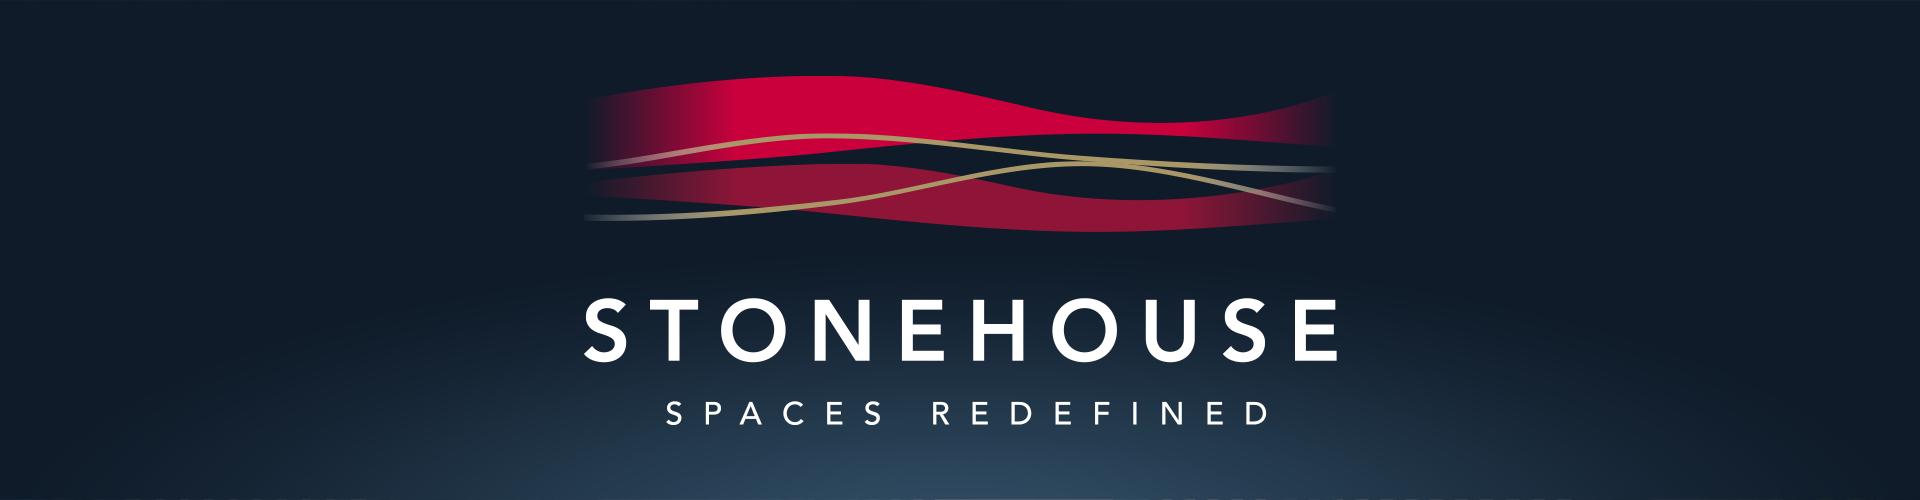 Stonehouse News Main Header Image